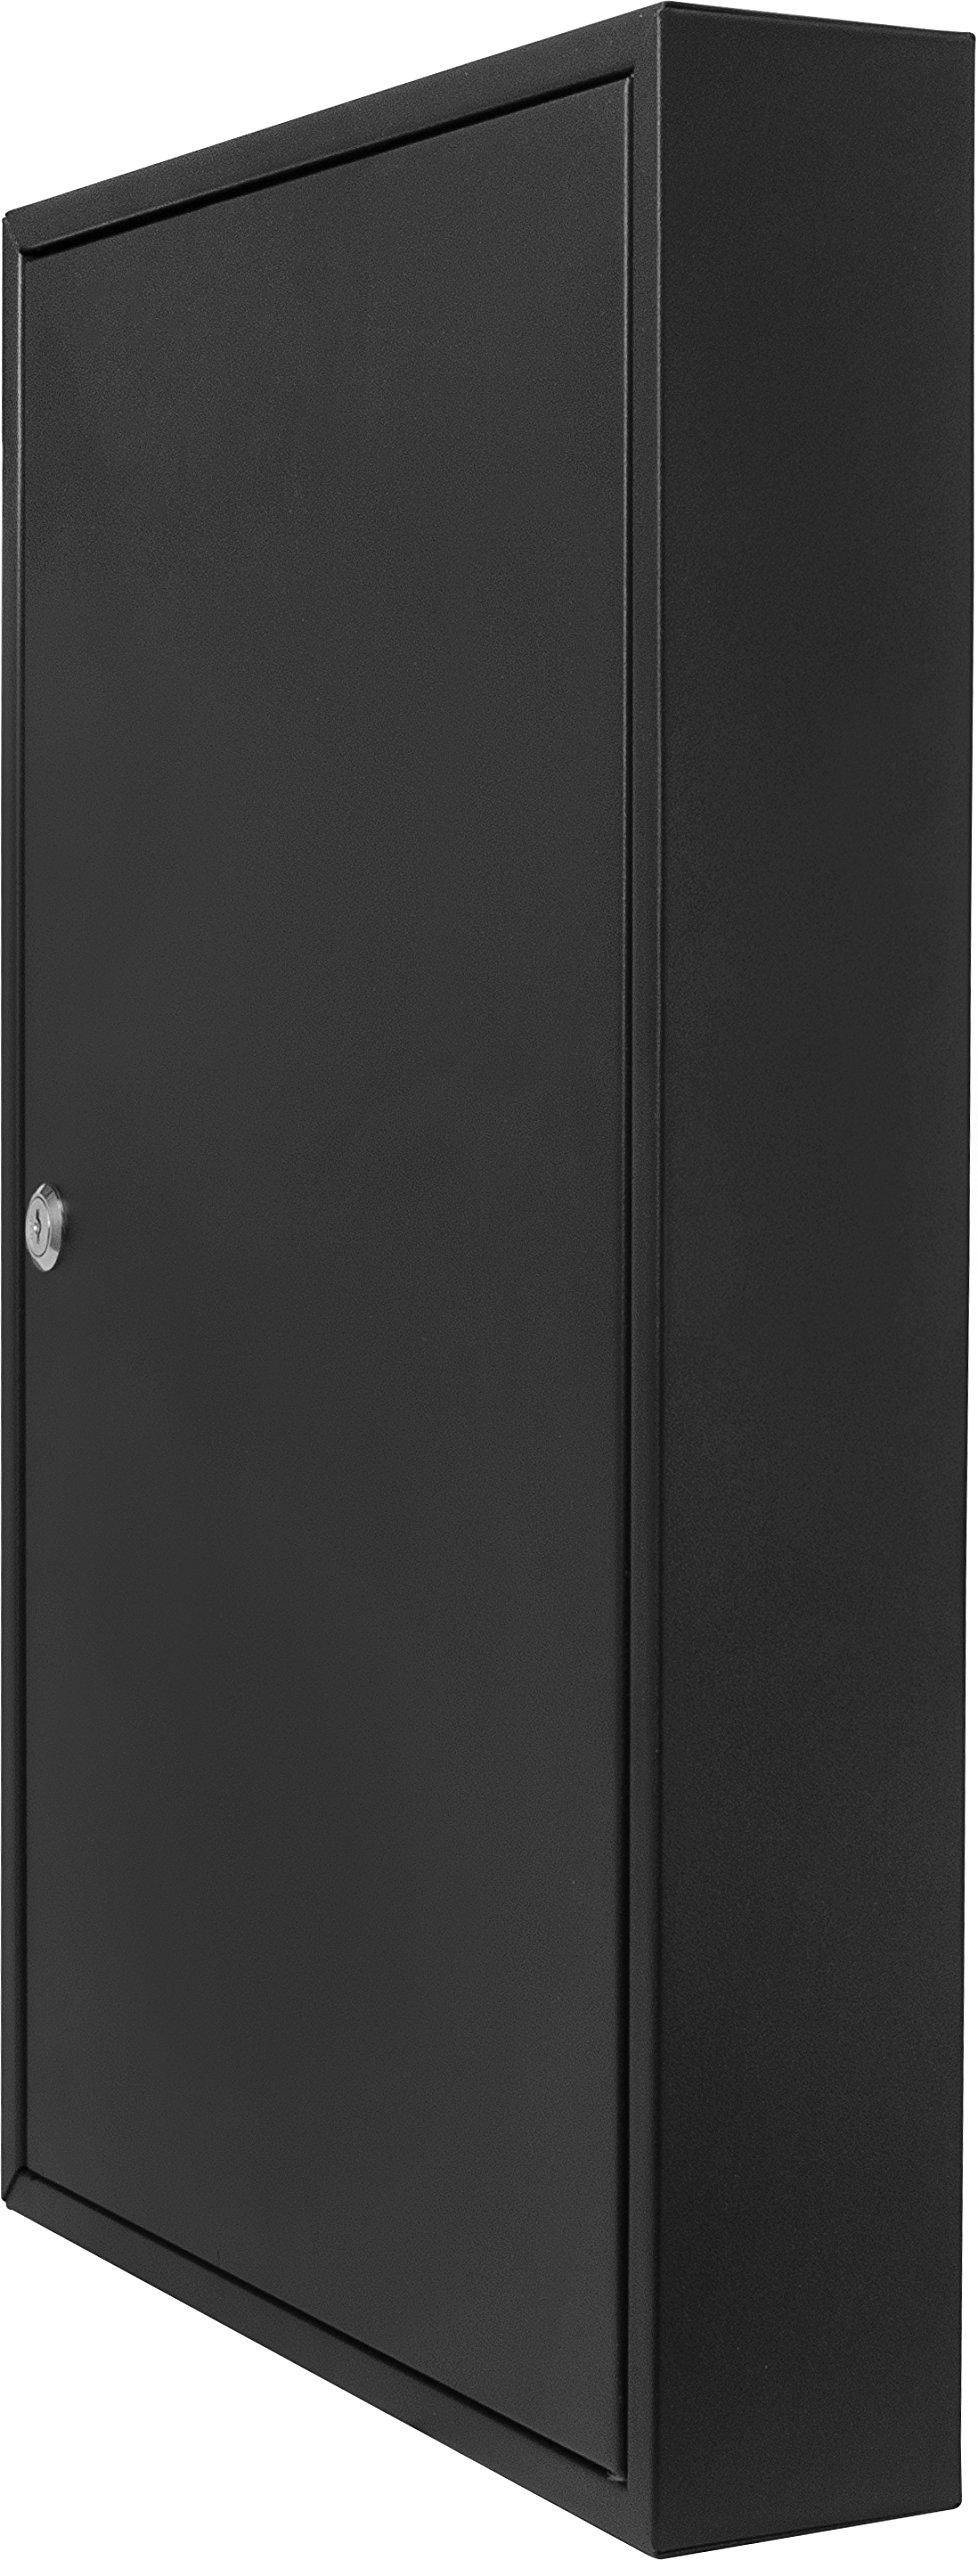 Barska 100 Position Key Cabinet with Key Lock, Black by BARSKA (Image #4)